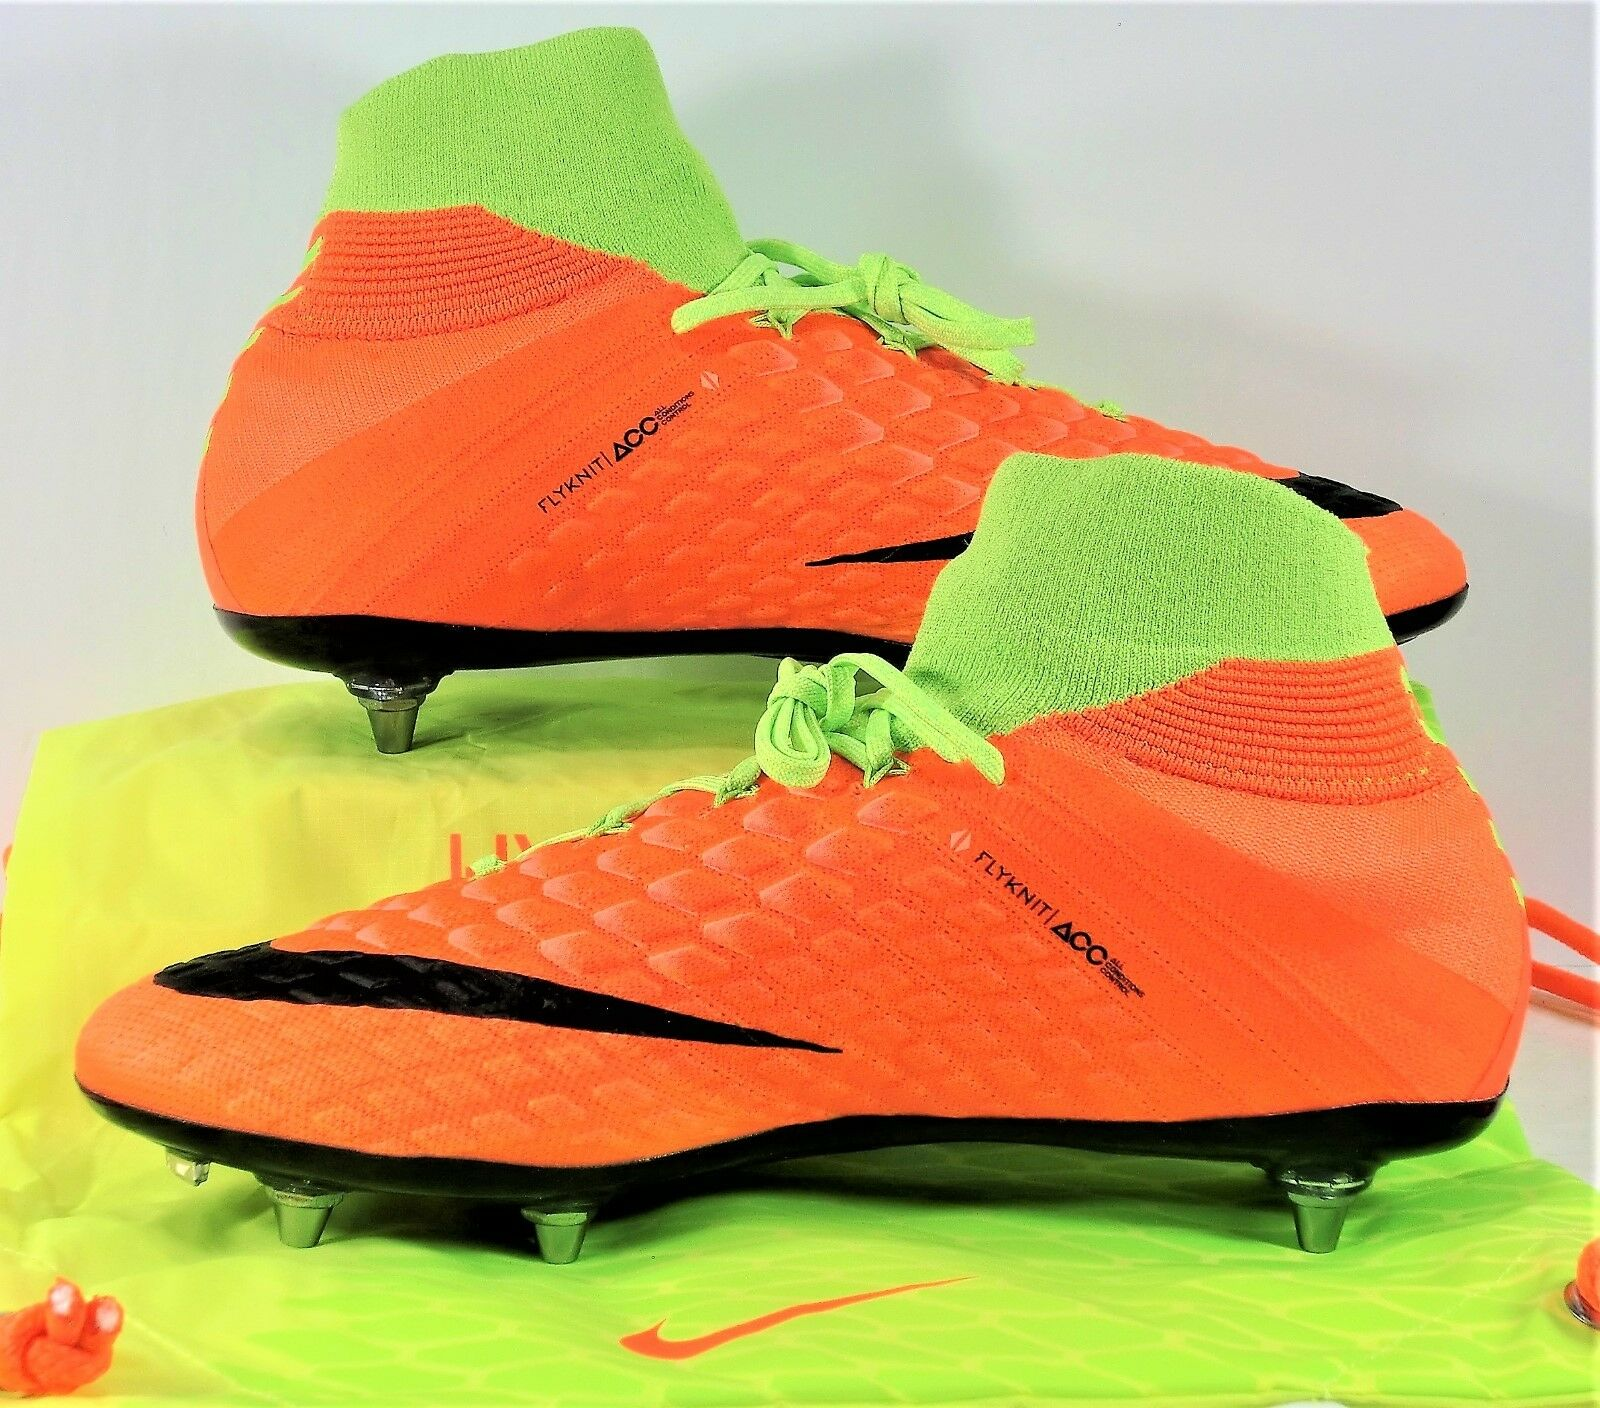 6355490181d7b Nike Hypervenom Phantom III DF SG Flyknit ACC Soccer Cleat Sz 11 ...